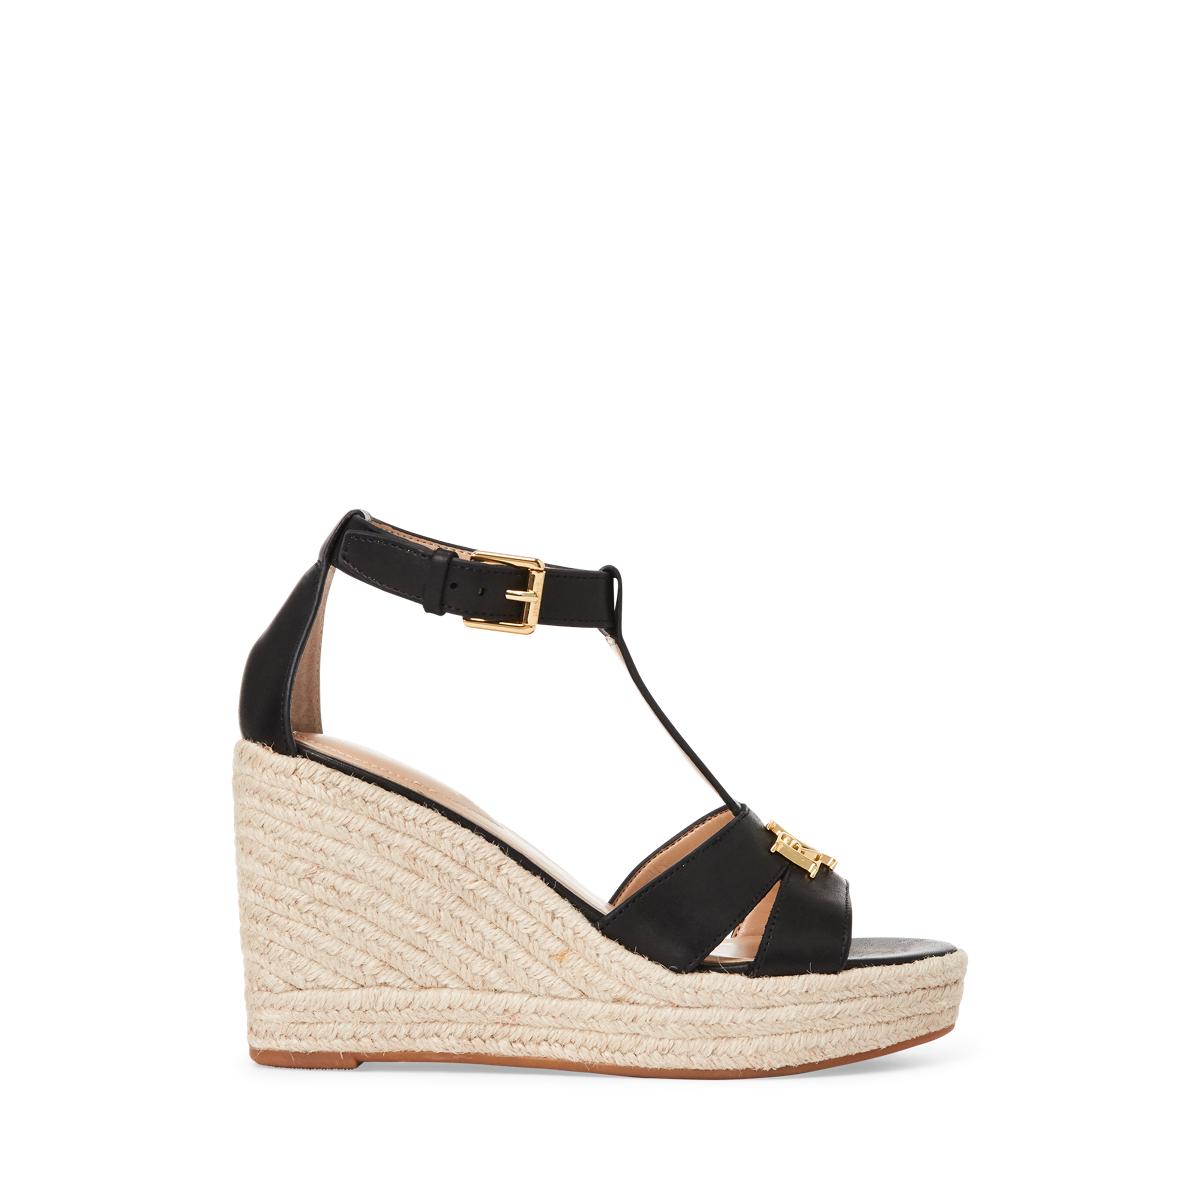 Hale Leather Sandal